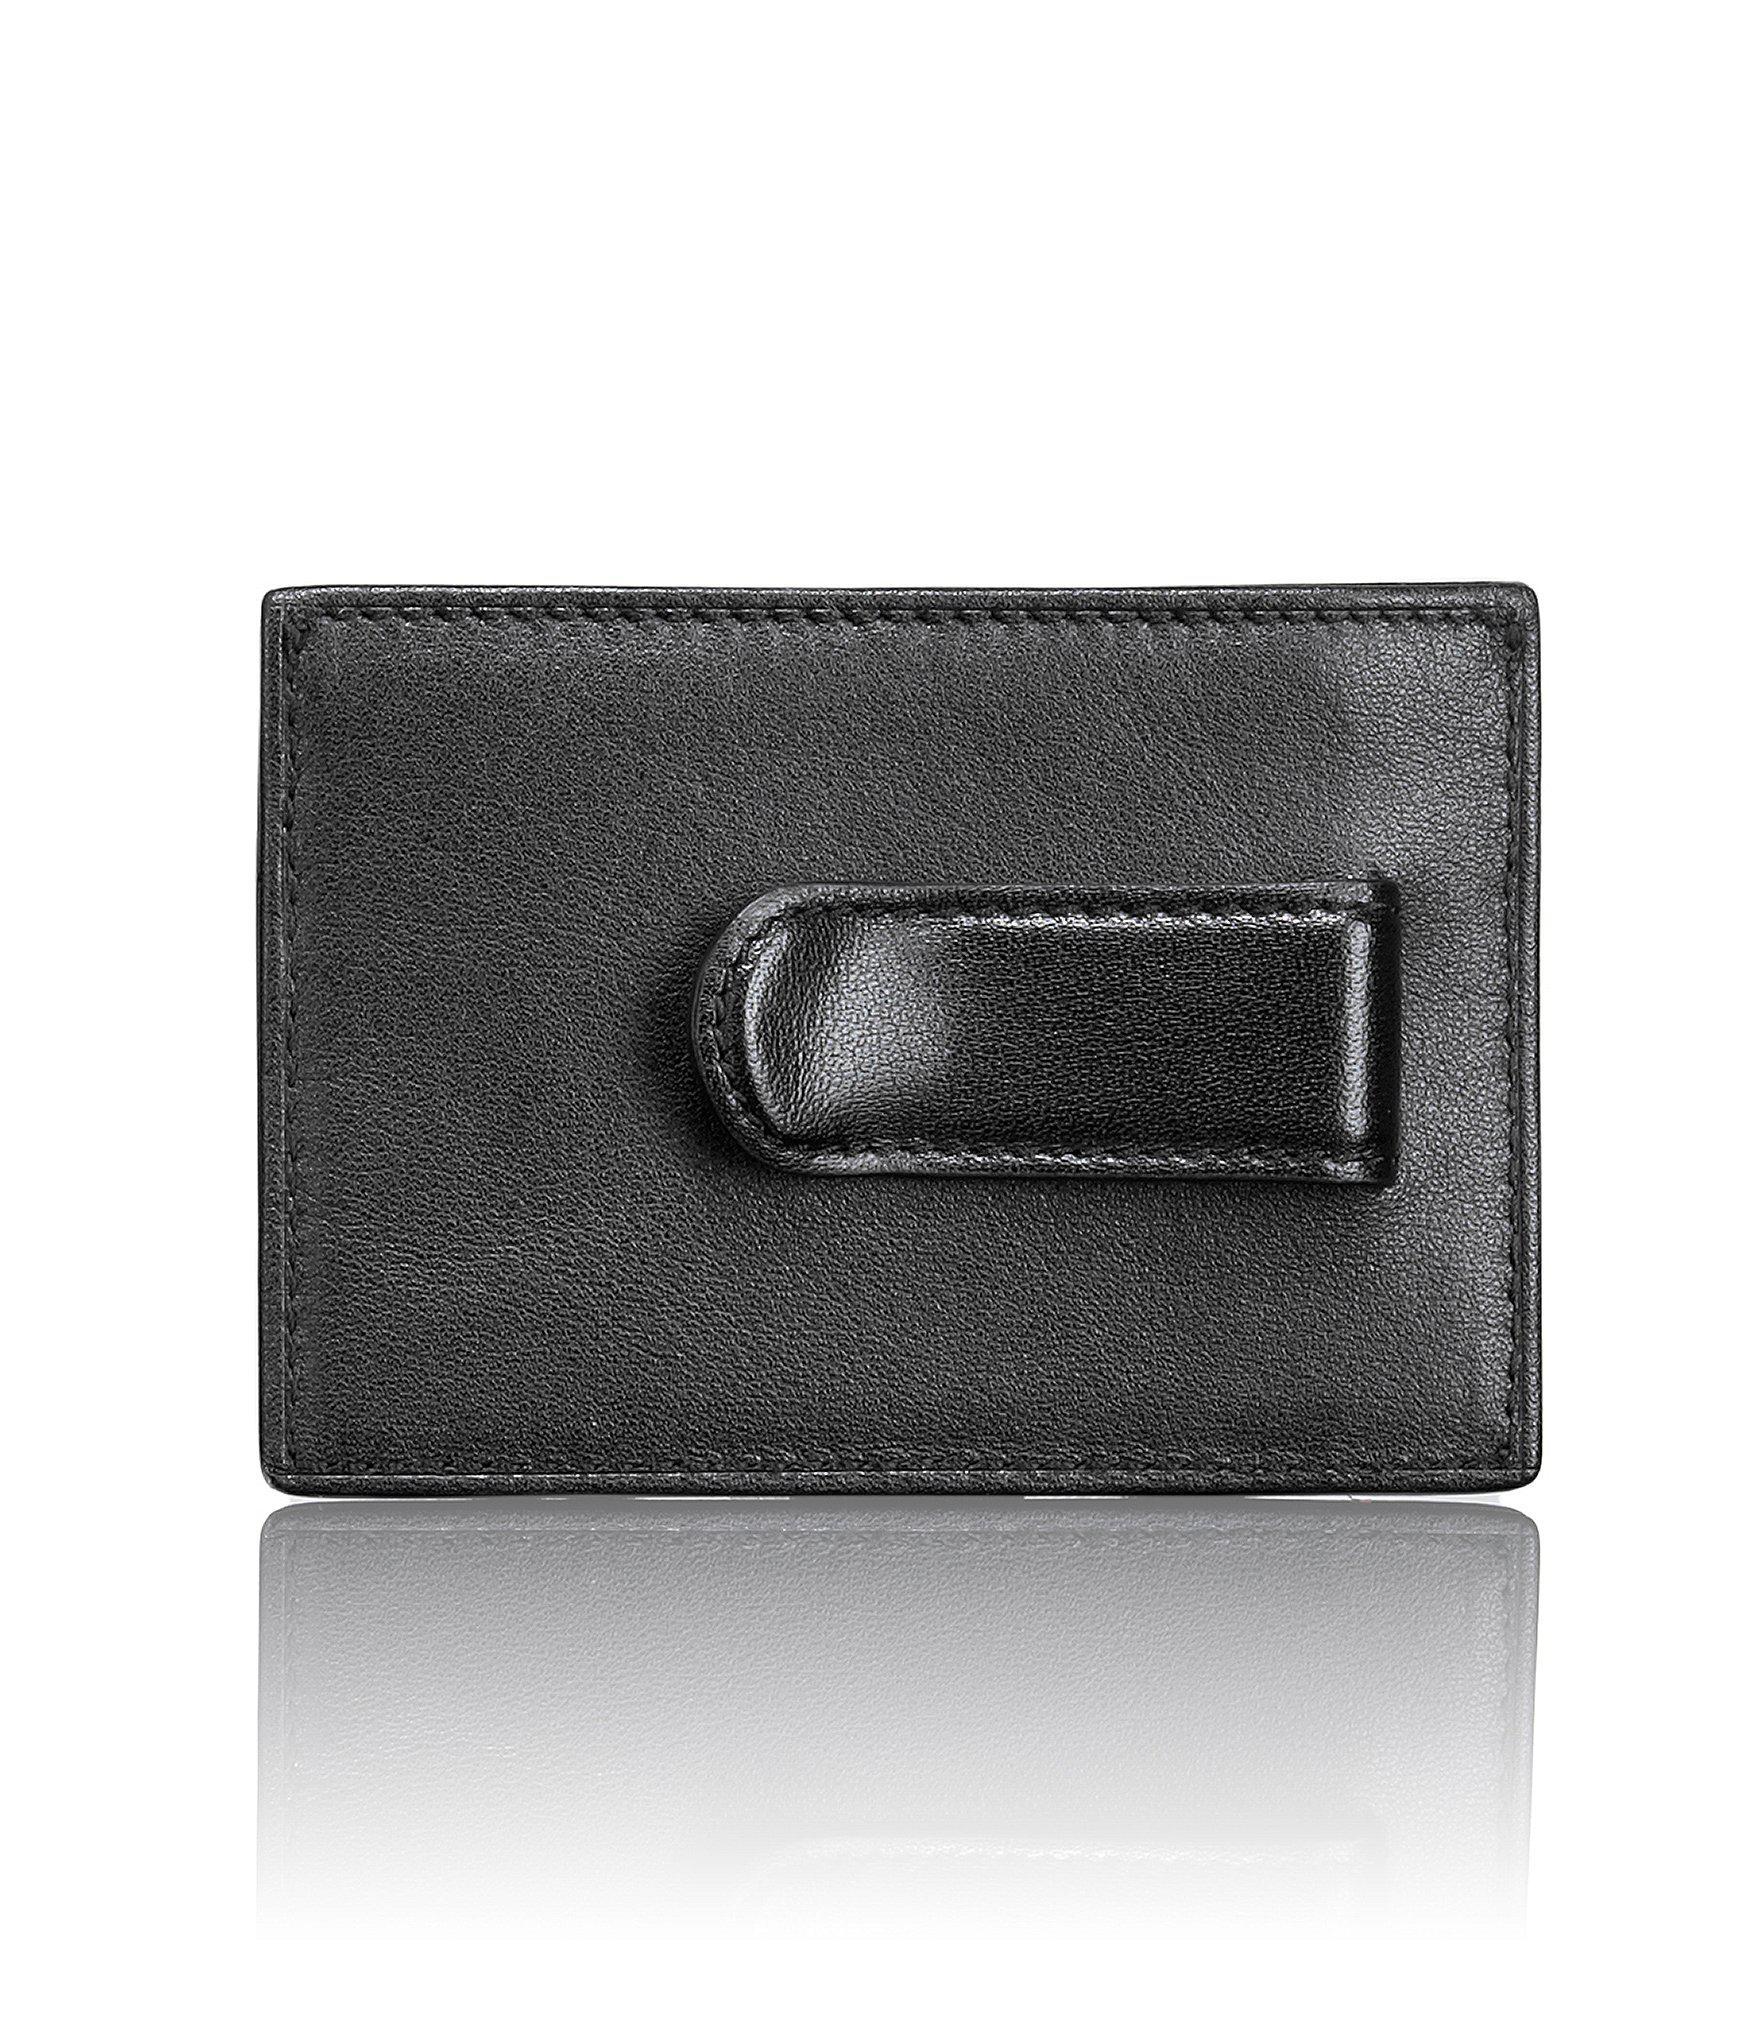 33568a2f566f05 Tumi - Black Id Lock Contrast Stitching Slim Card Case for Men - Lyst. View  fullscreen